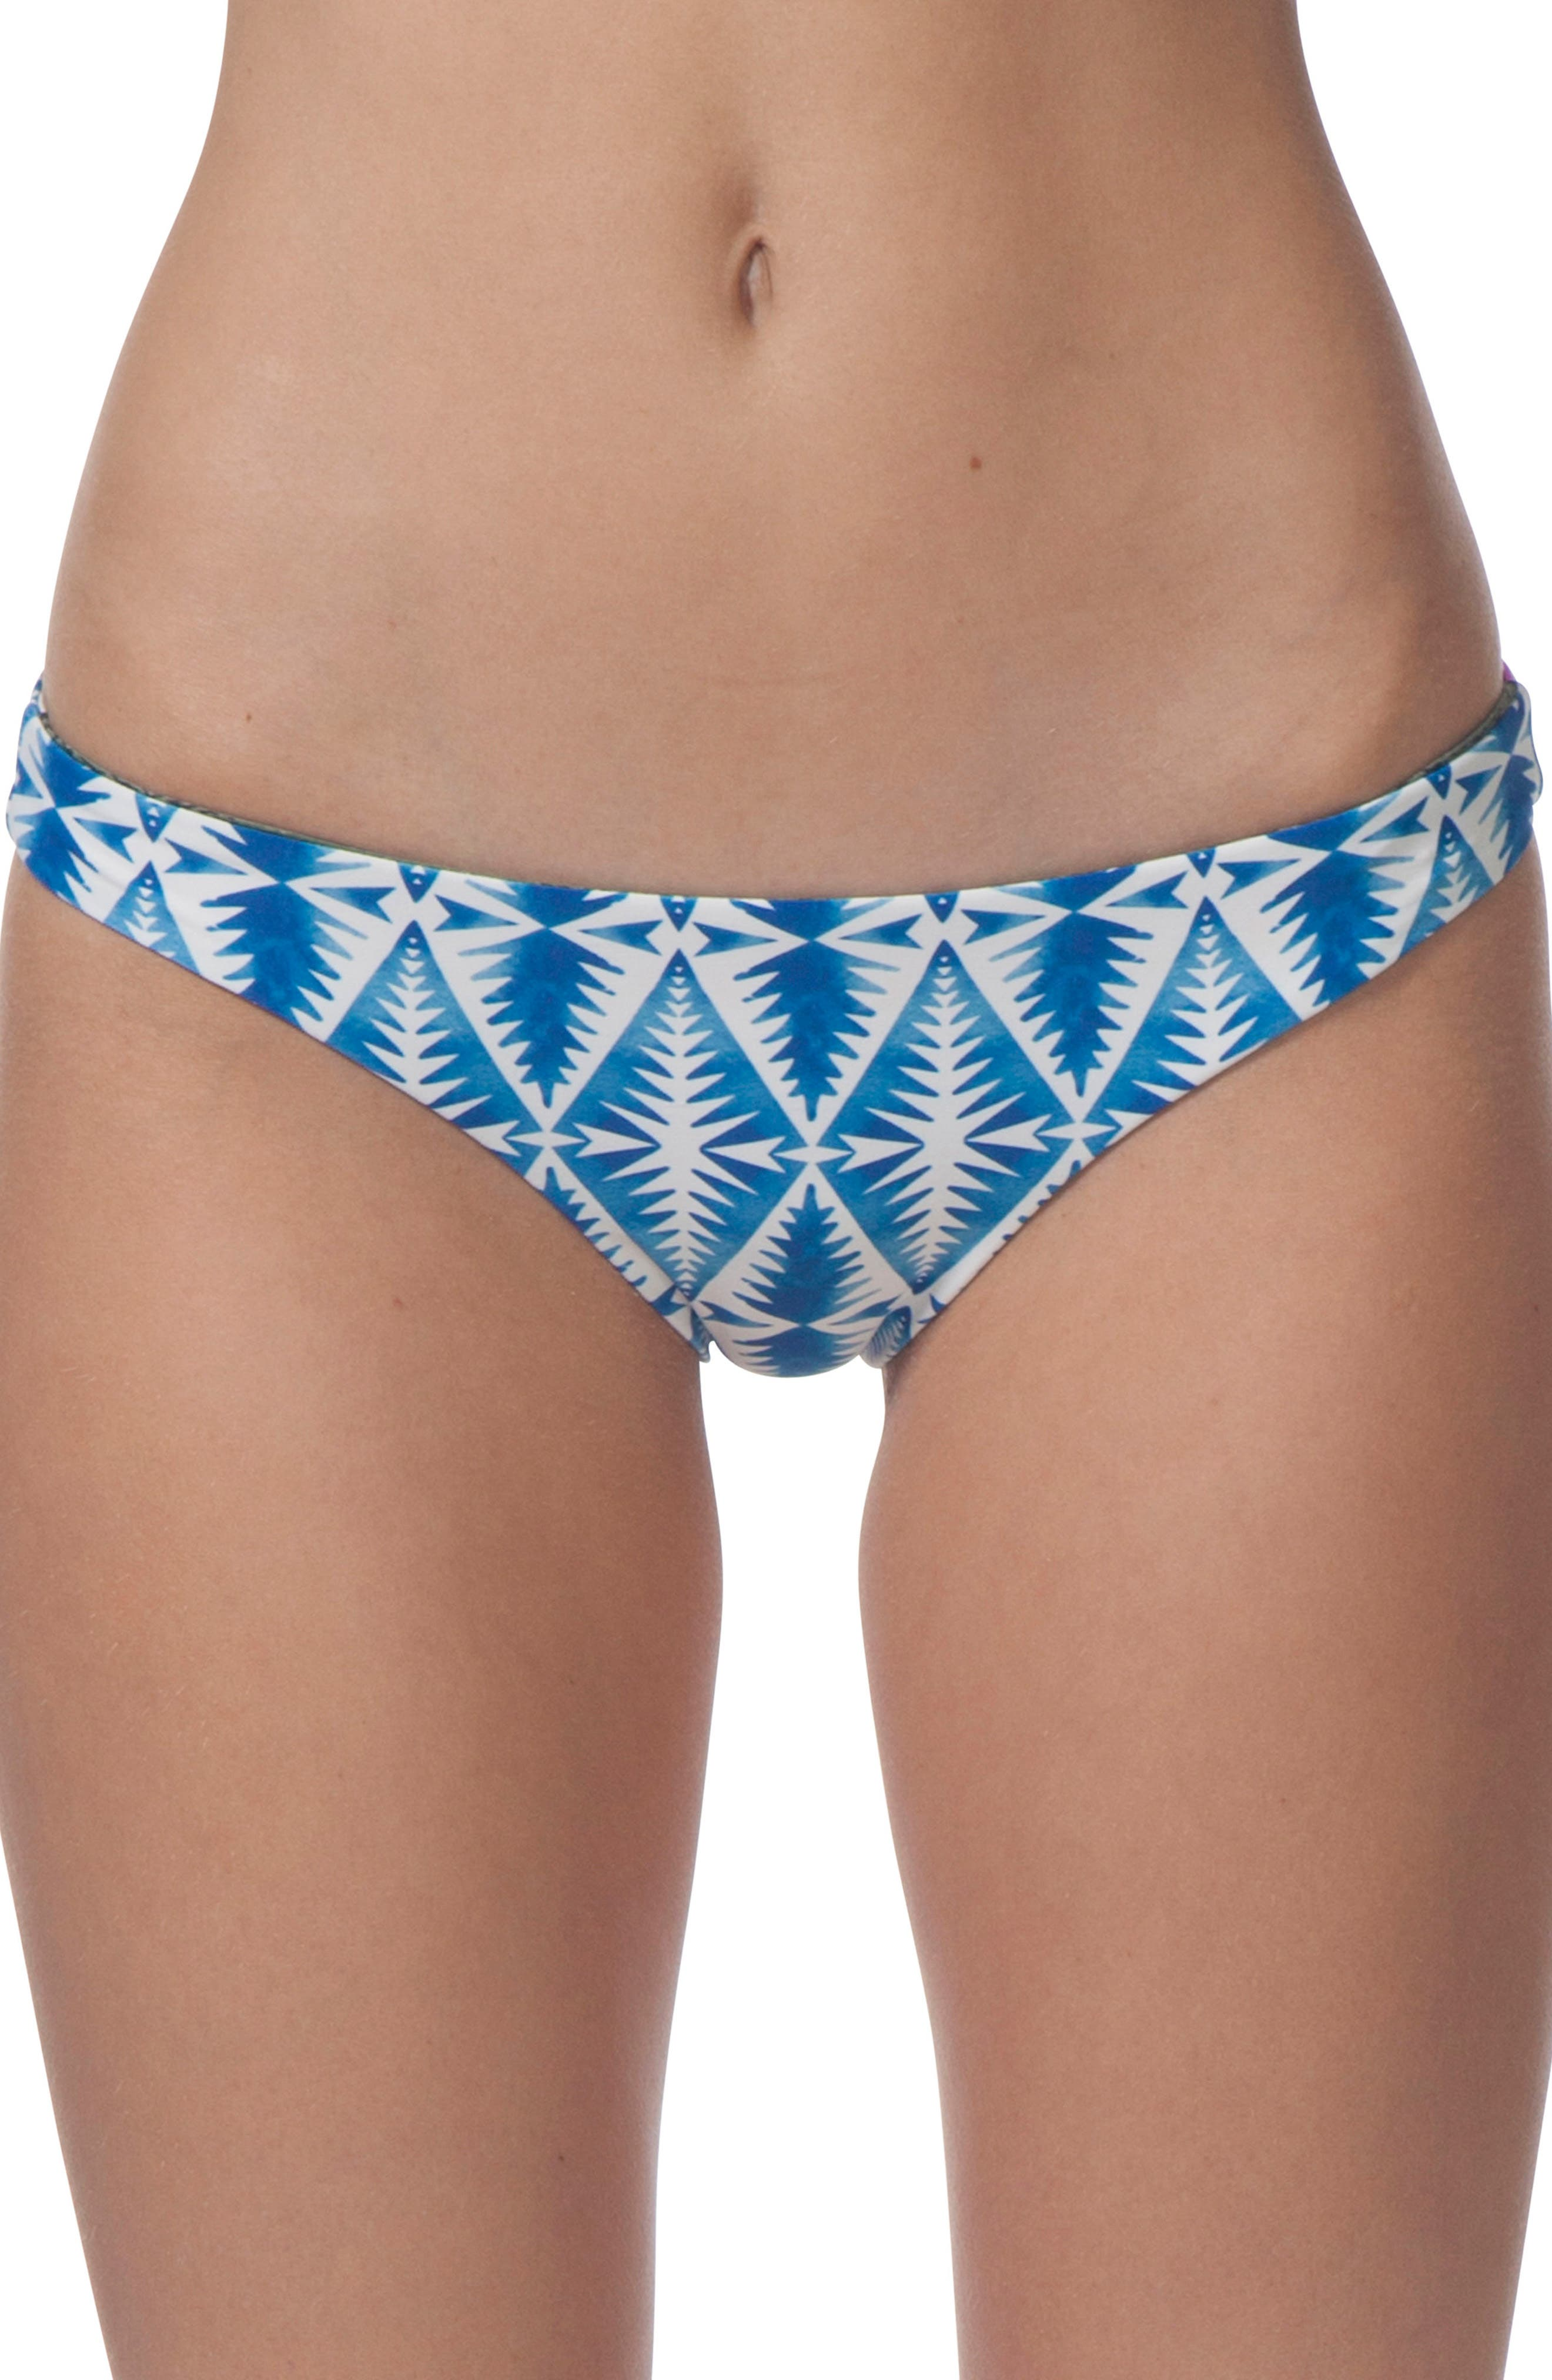 Beach Bazaar Reversible Hipster Bikini Bottoms,                         Main,                         color, 400